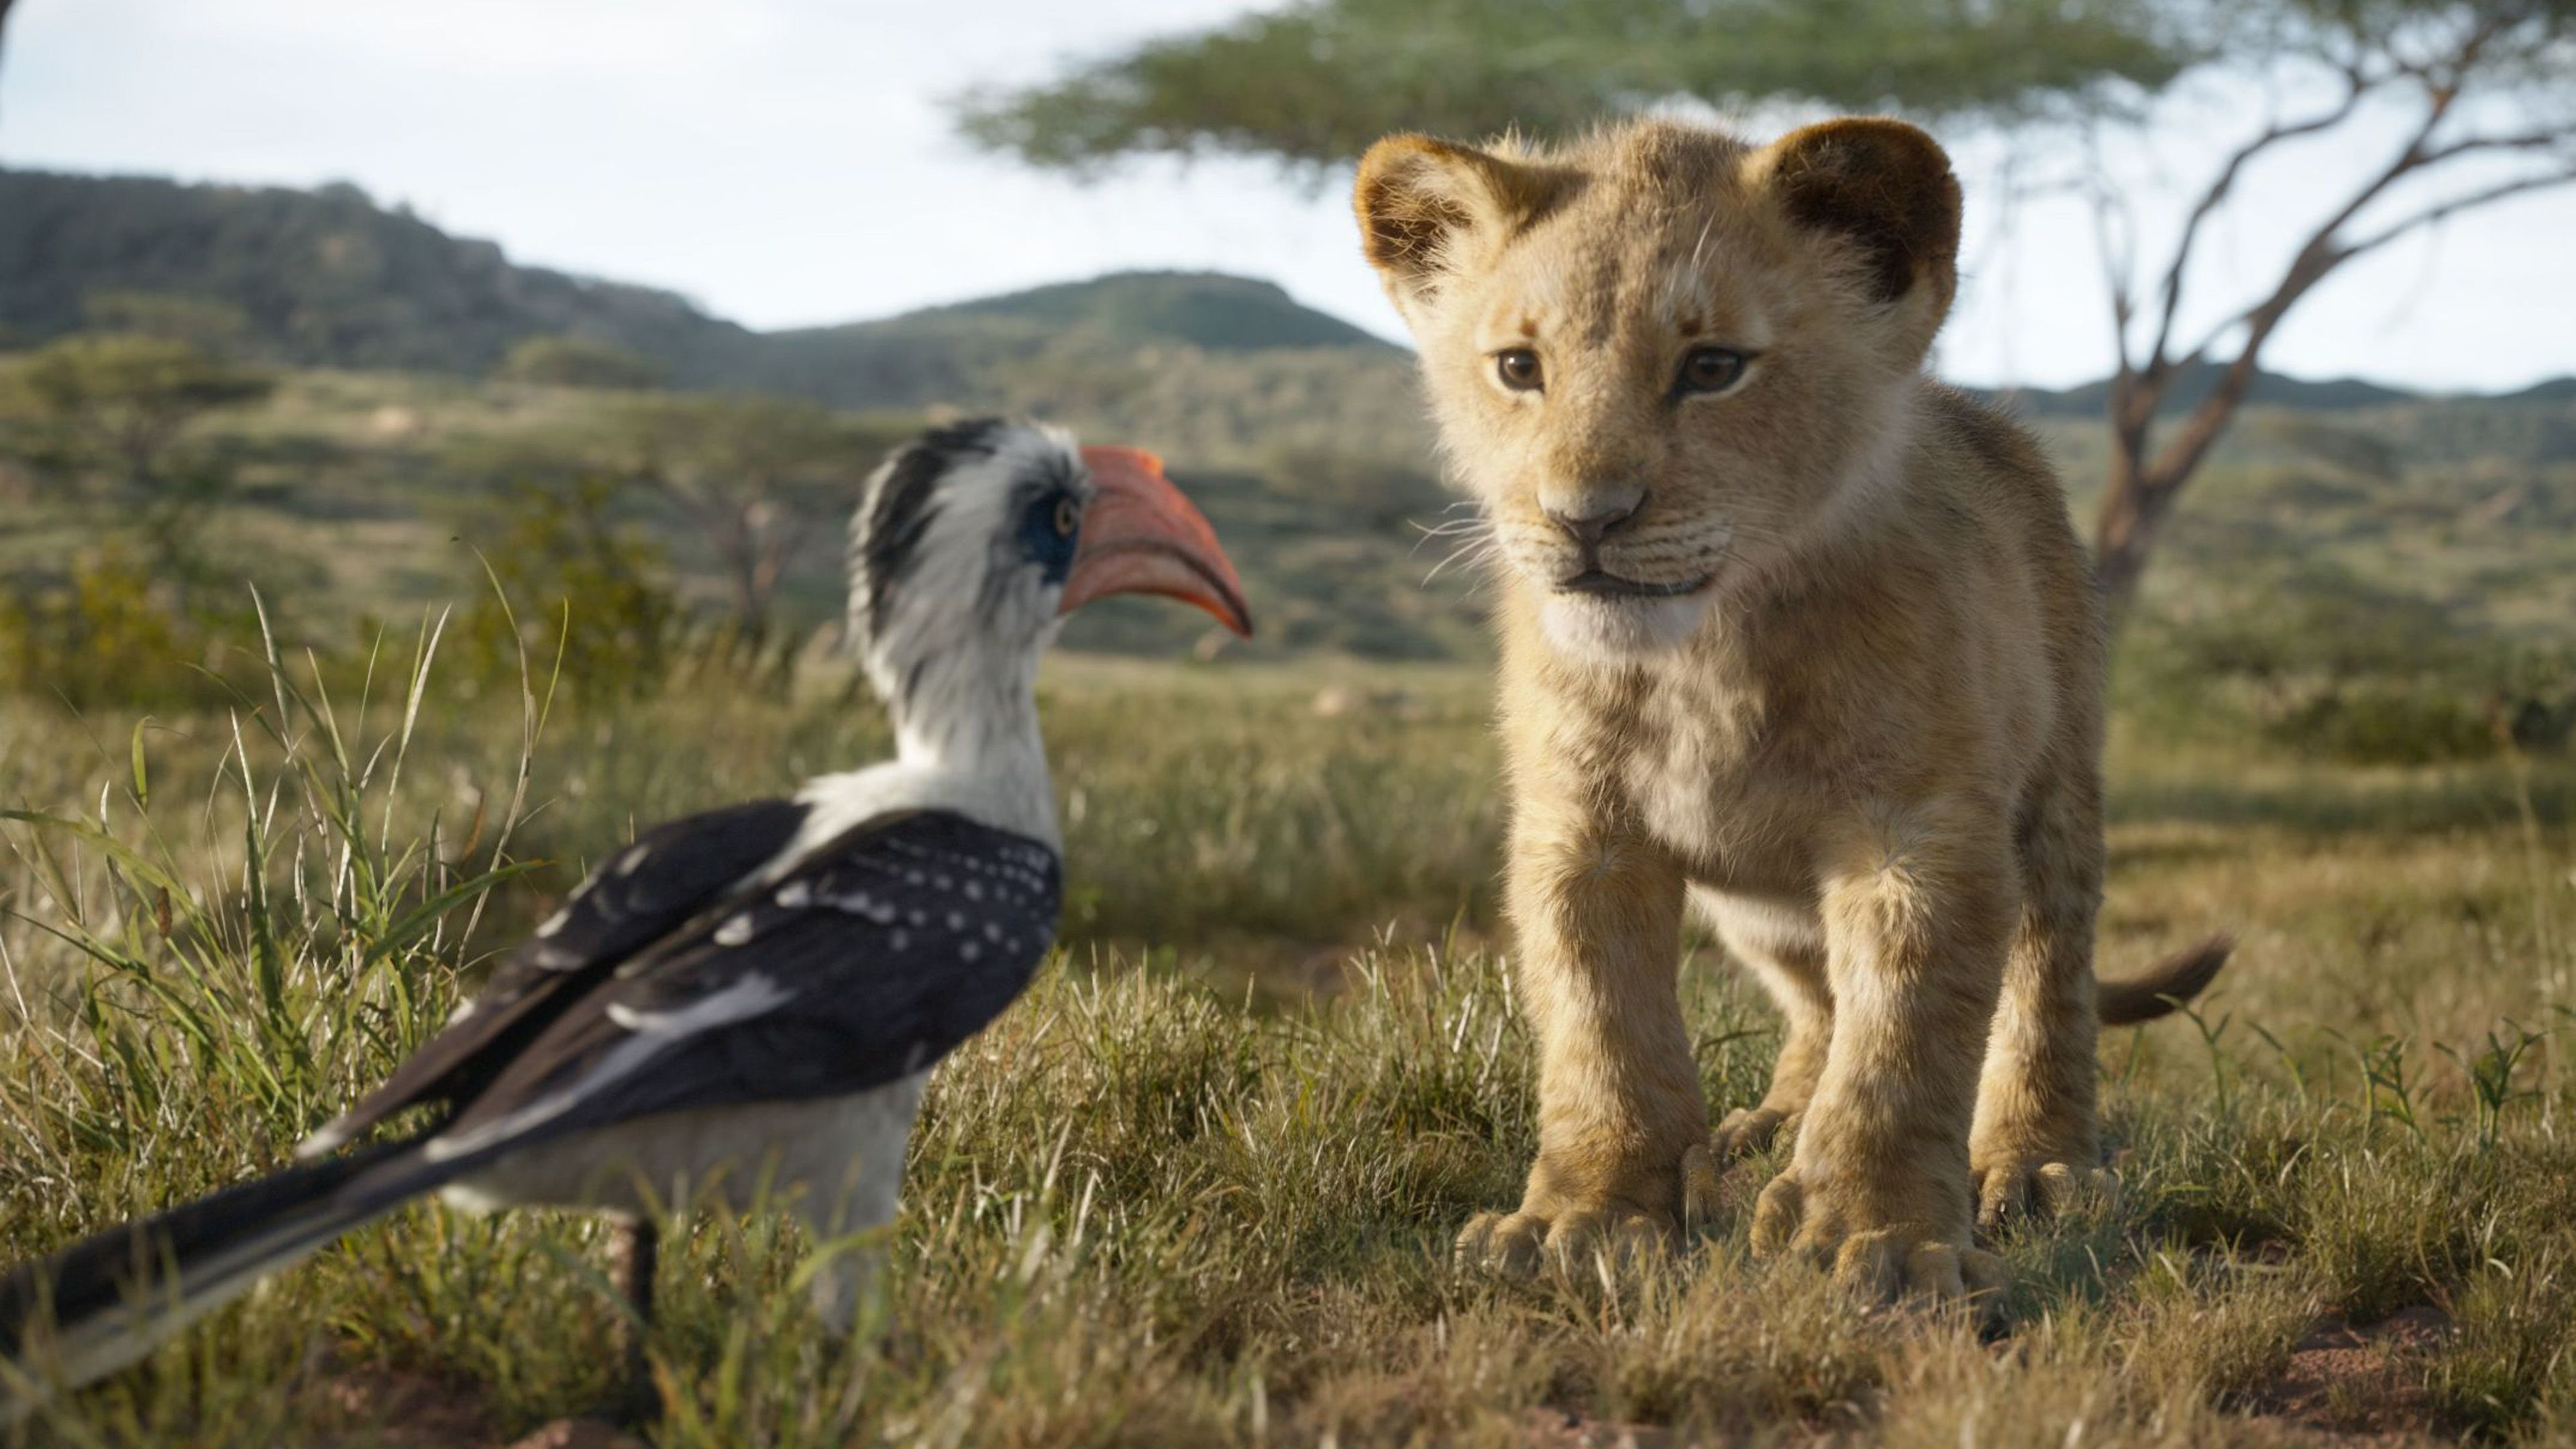 Wallpaper 4k The Lion King Simba 4k 2019 Movies Wallpapers